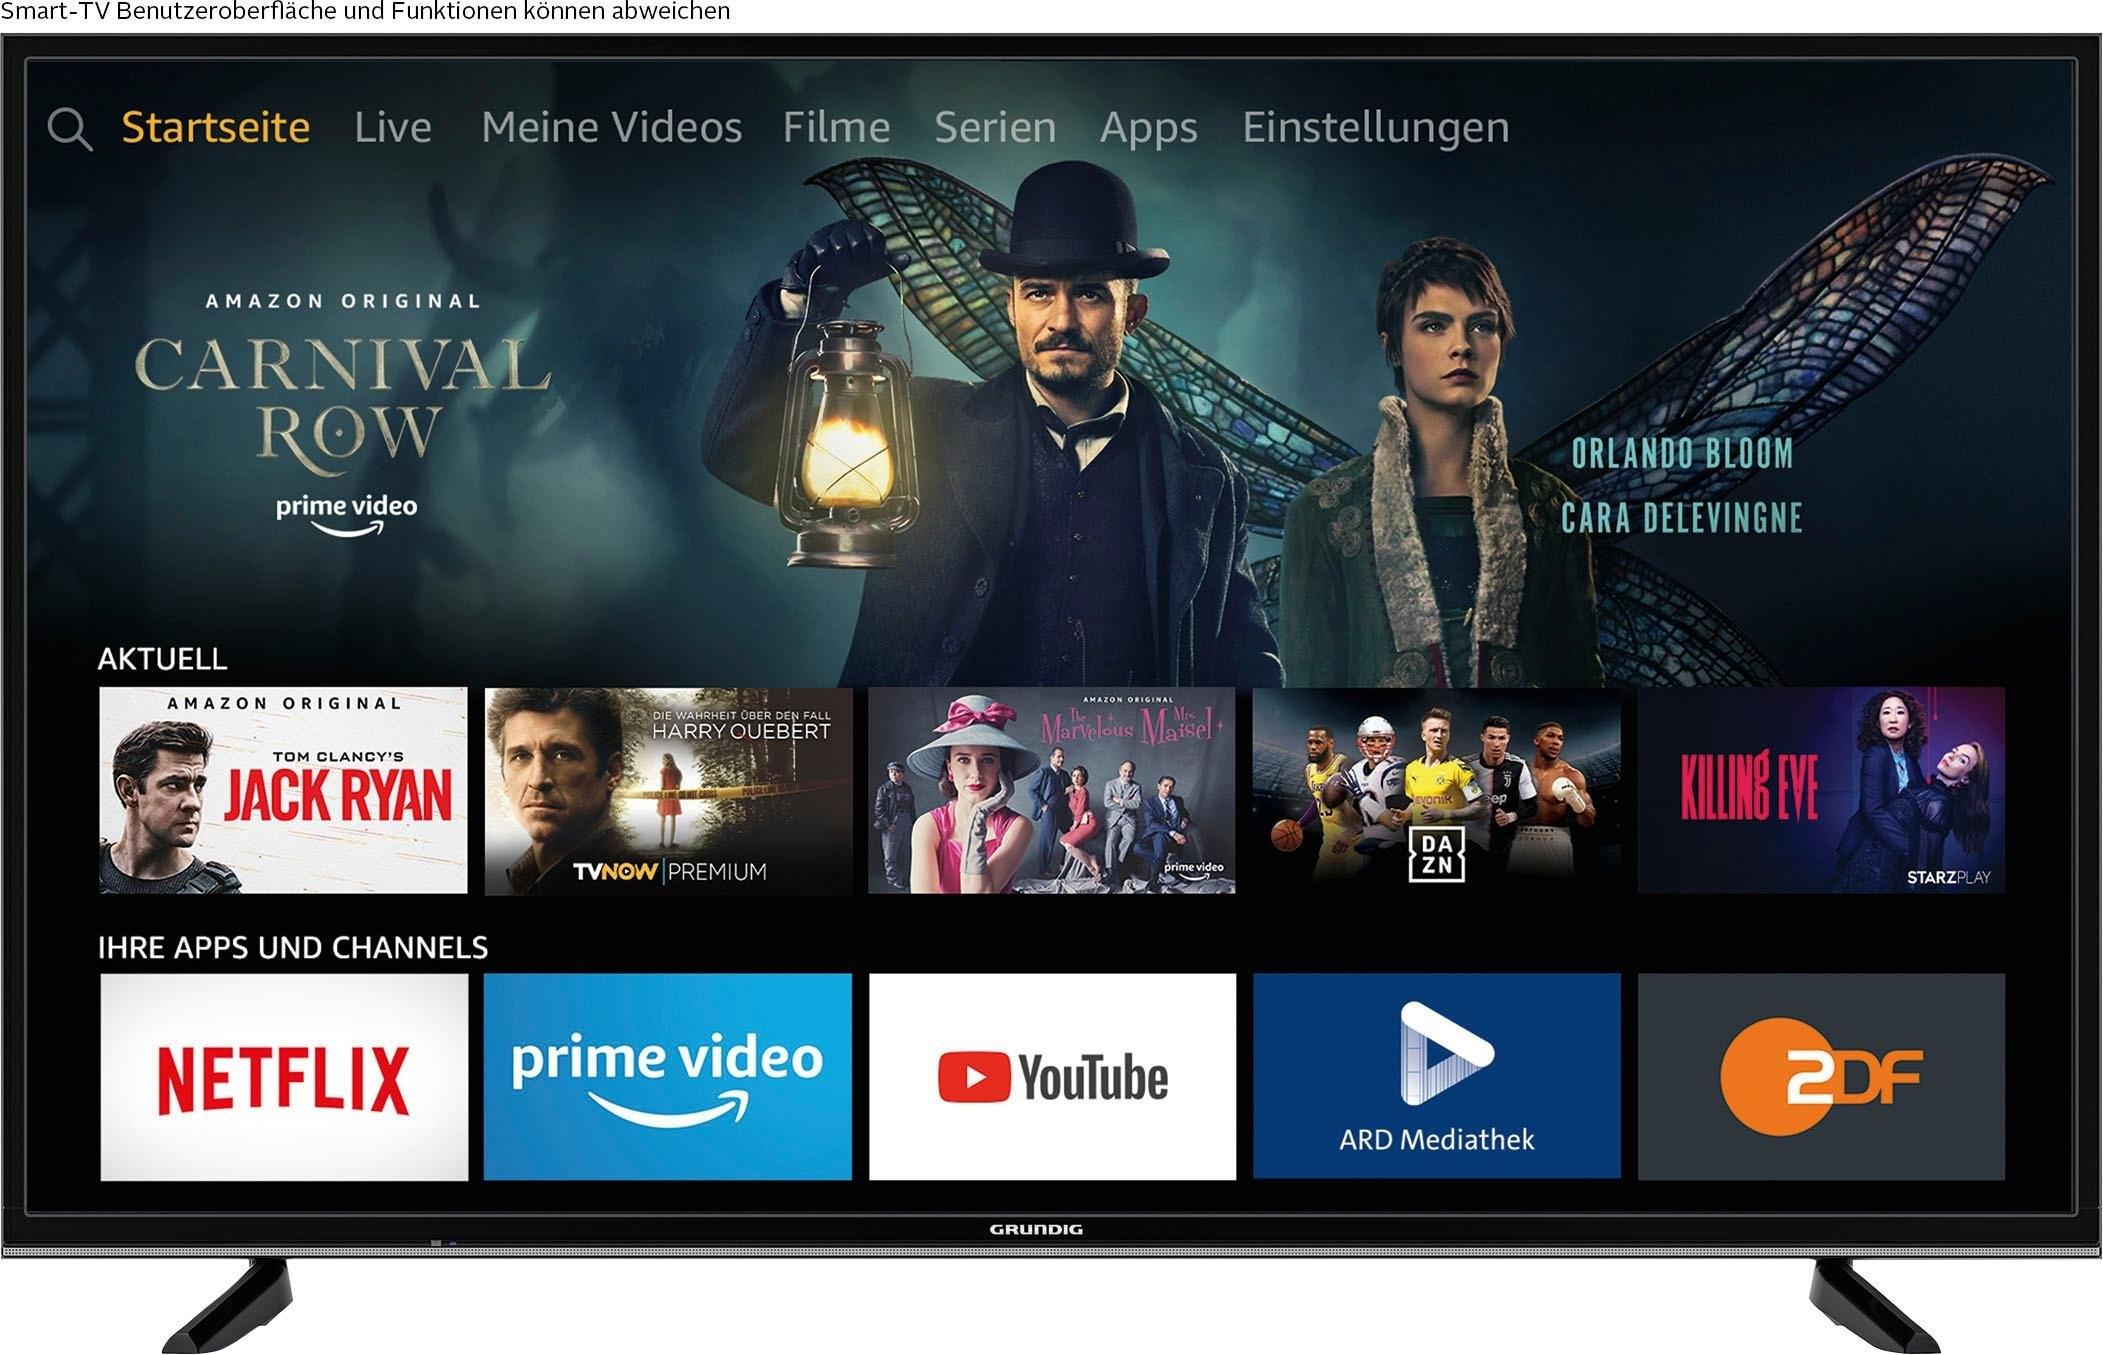 Grundig 55 VLX 7020 led-tv (139 cm / 55 inch), 4K Ultra HD, smart-tv voordelig en veilig online kopen